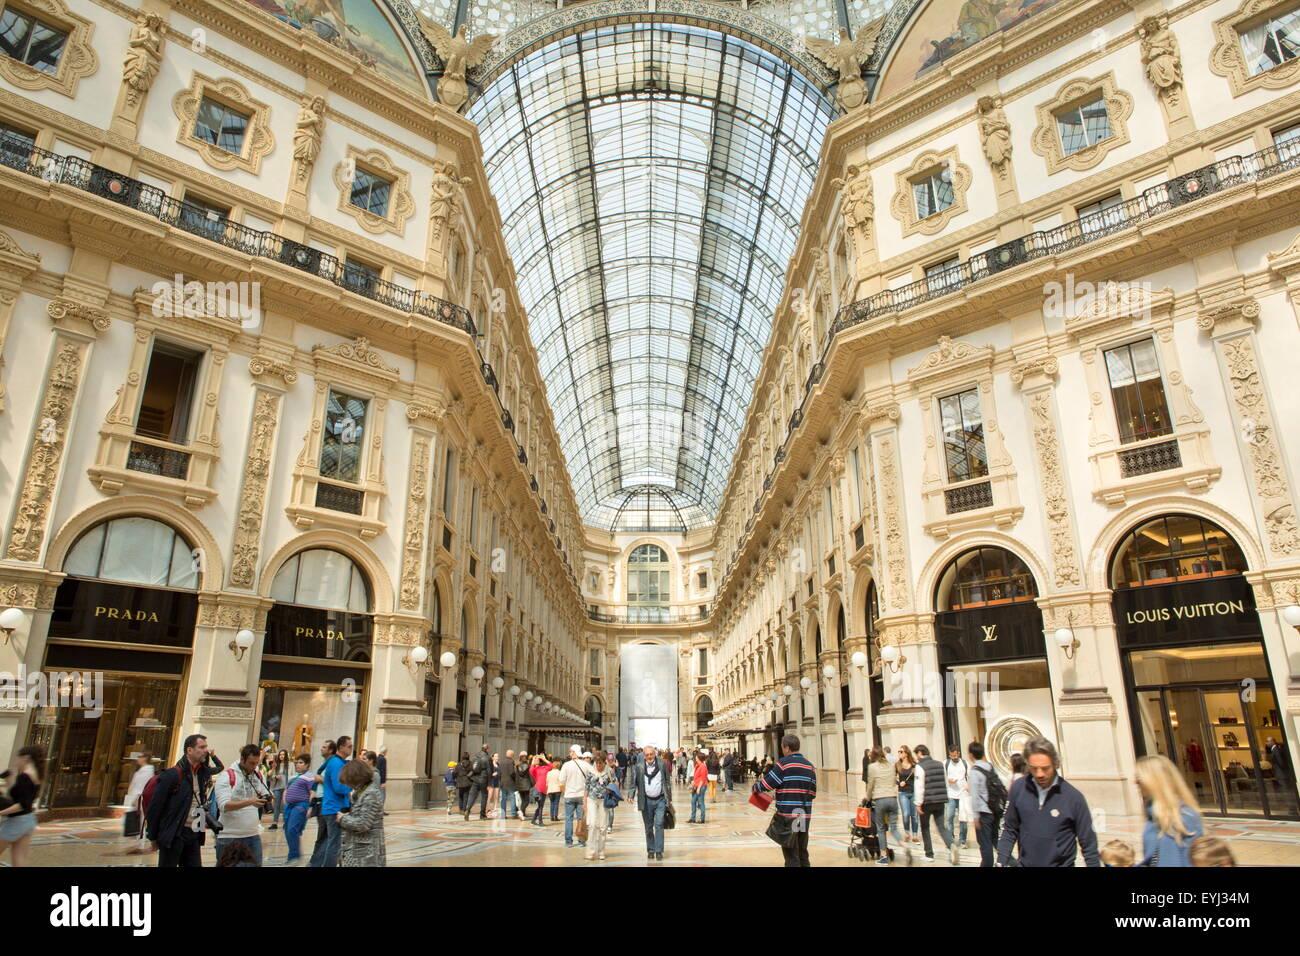 Galleria Vittorio Emanuele II, Milan, Milano Mailand Lombardy region, Italy - Stock Image